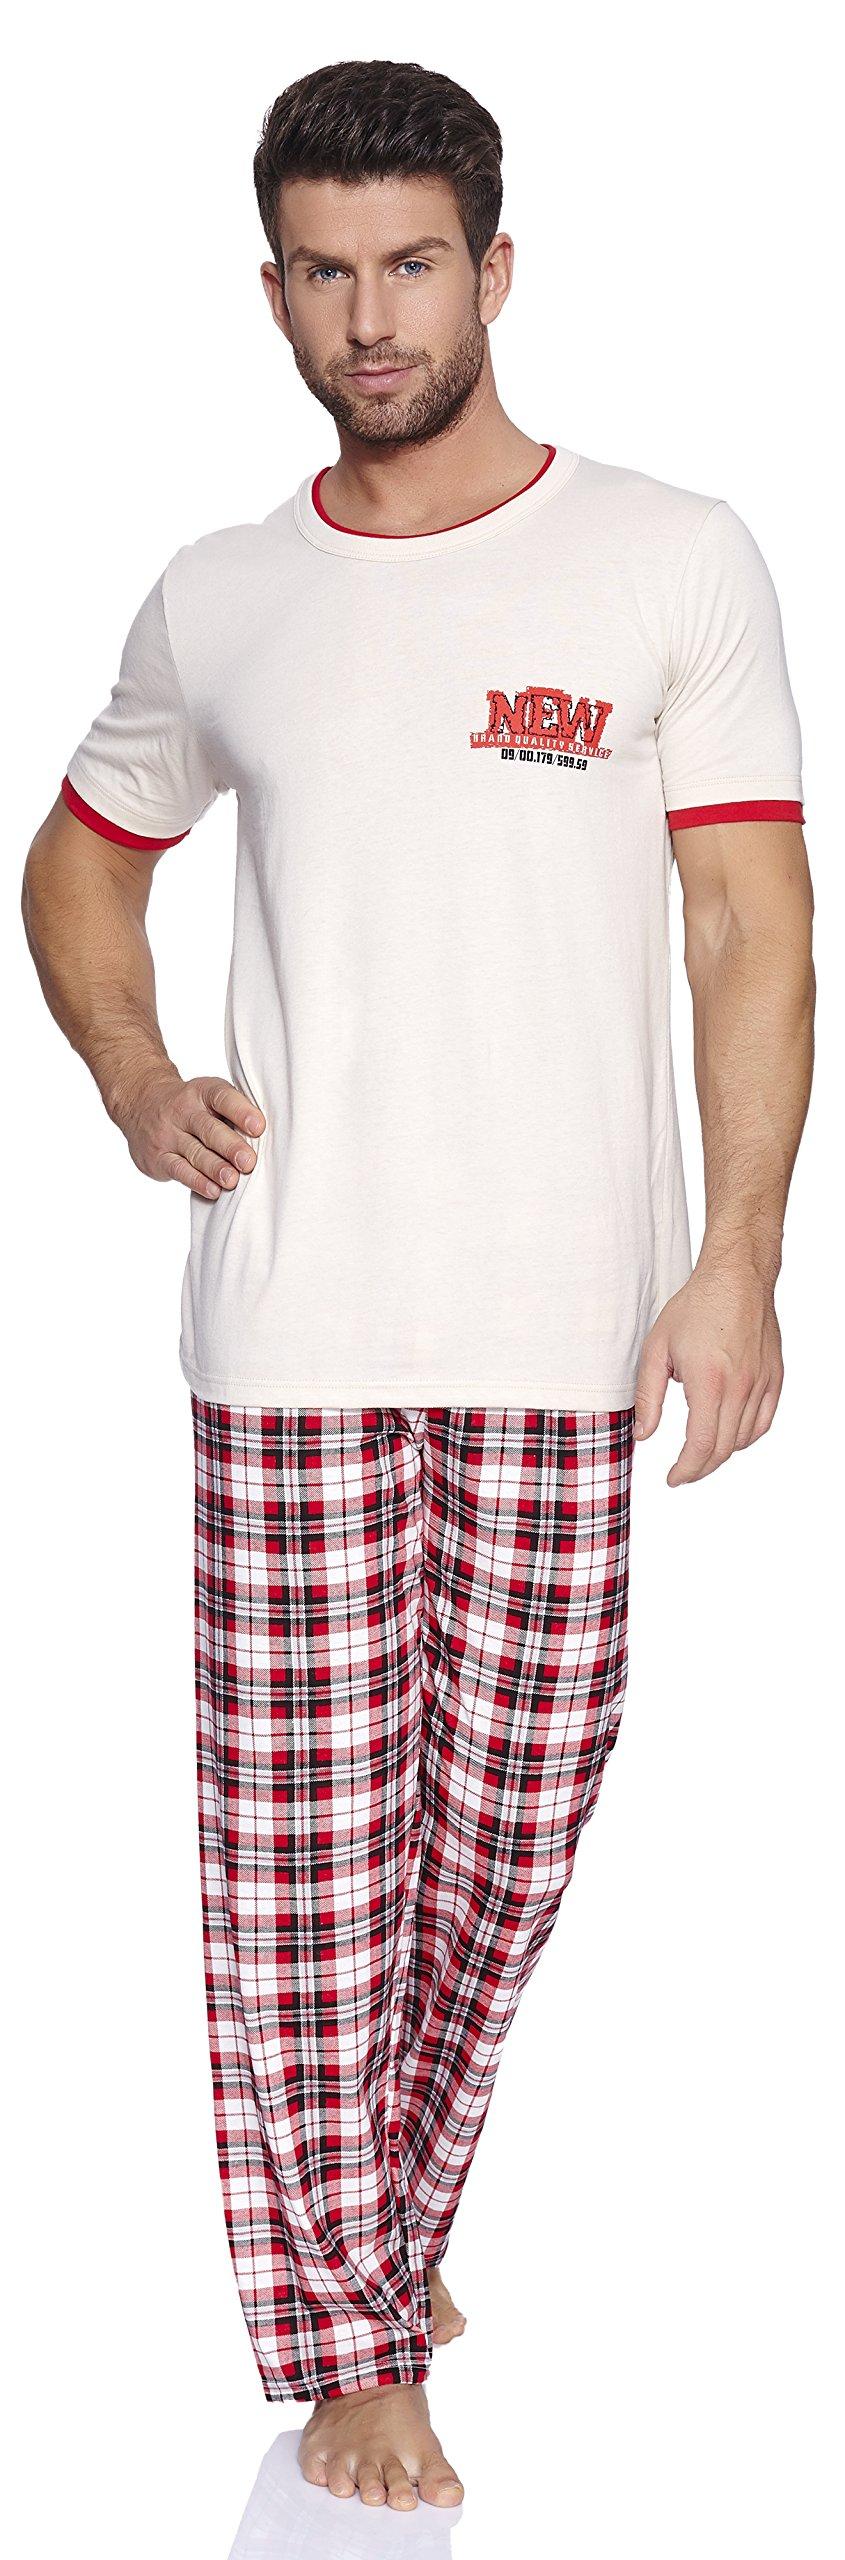 Italian Fashion IF Pijamas para Hombre Domenico 0230 product image